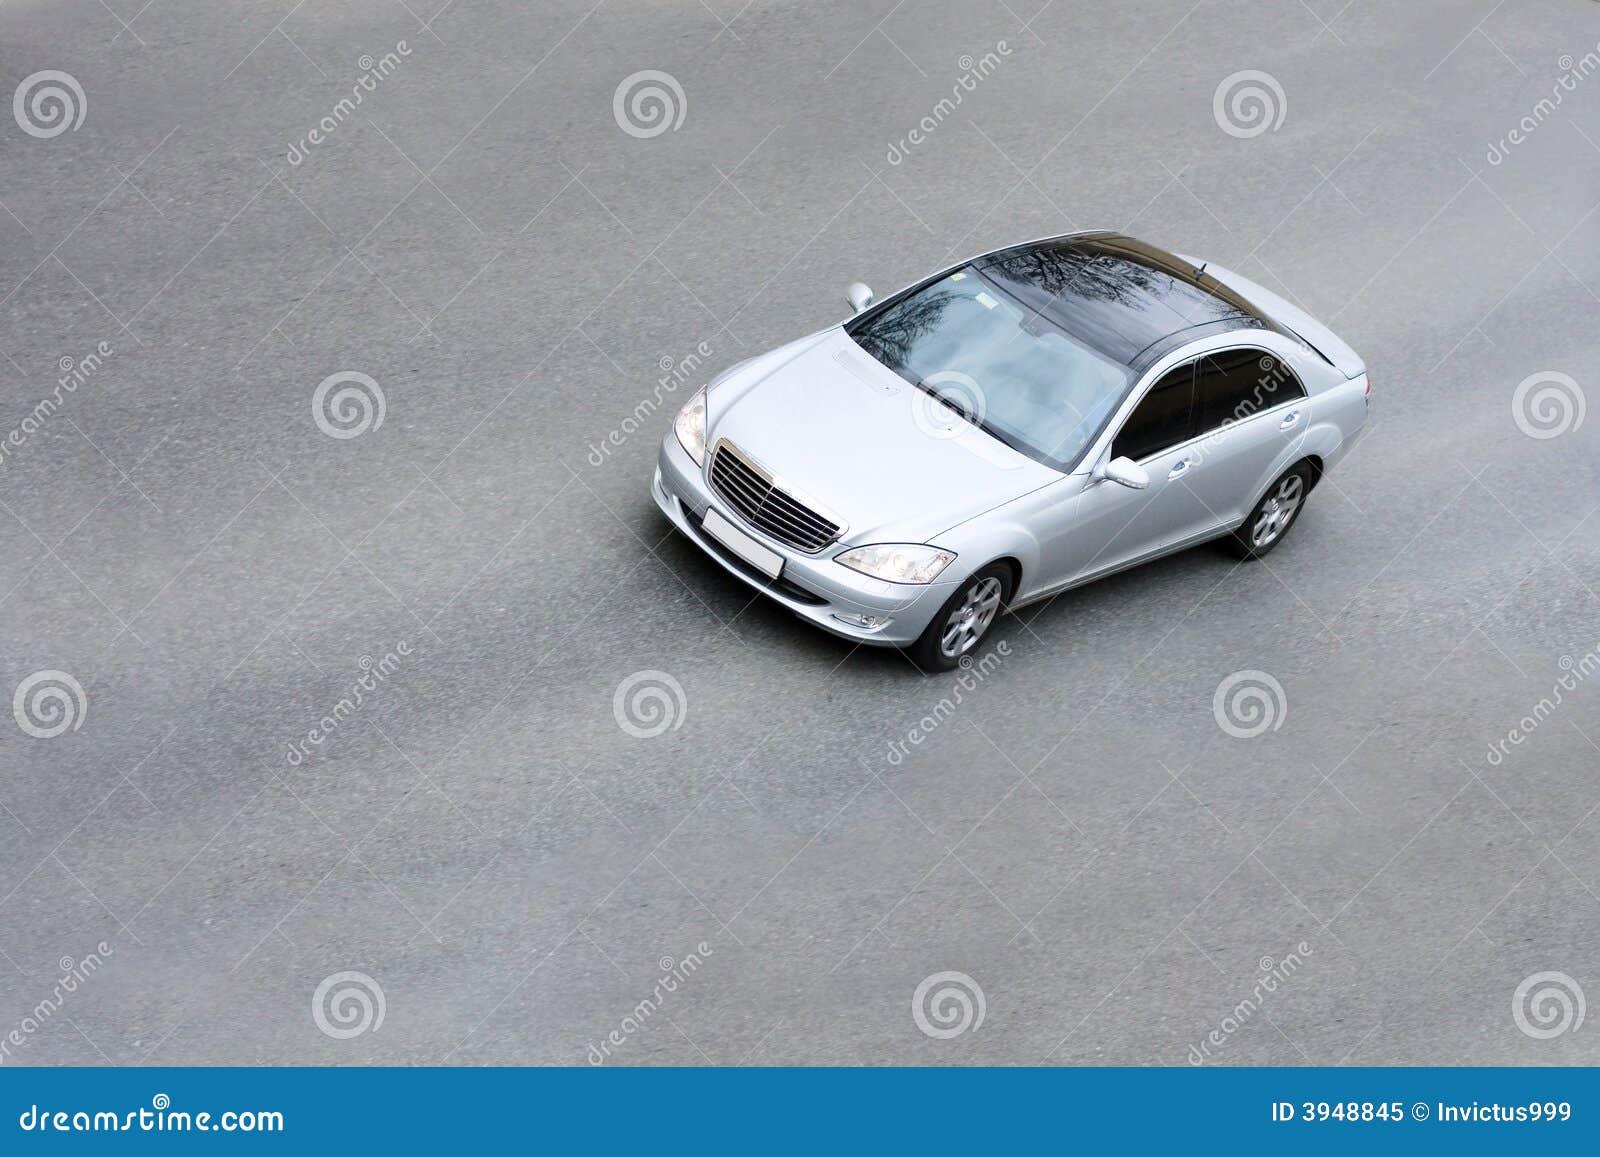 versilbern sie auto stockbild. bild von sedan, daimler - 3948845